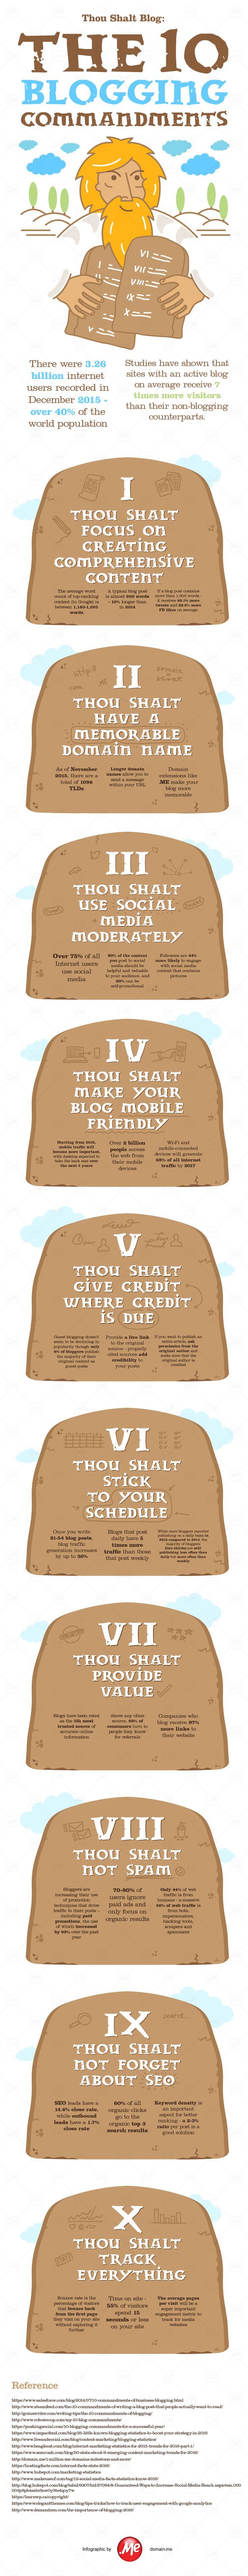 Thou Shalt Blog – The 10 Blogging Commandments - #infographic